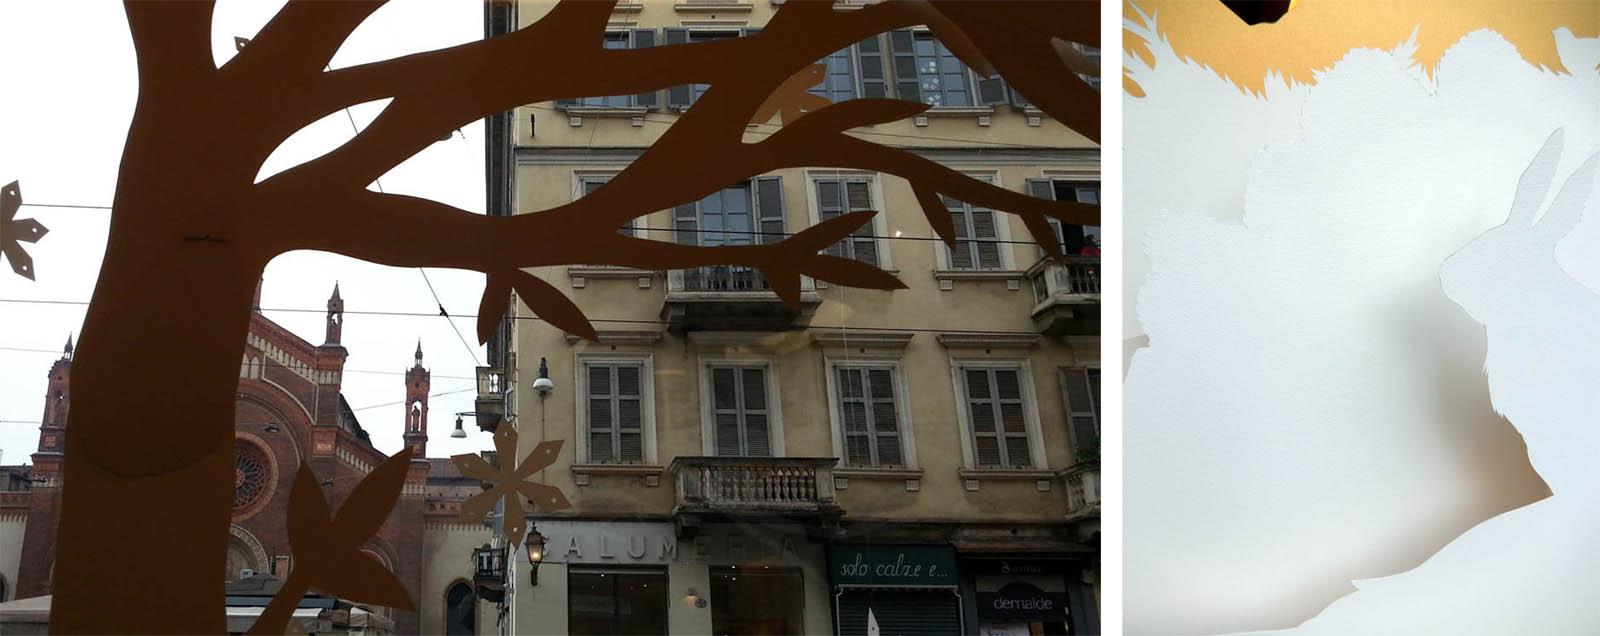 inverno-papercut-fabriano-vetrine-wonderland-milano (6)